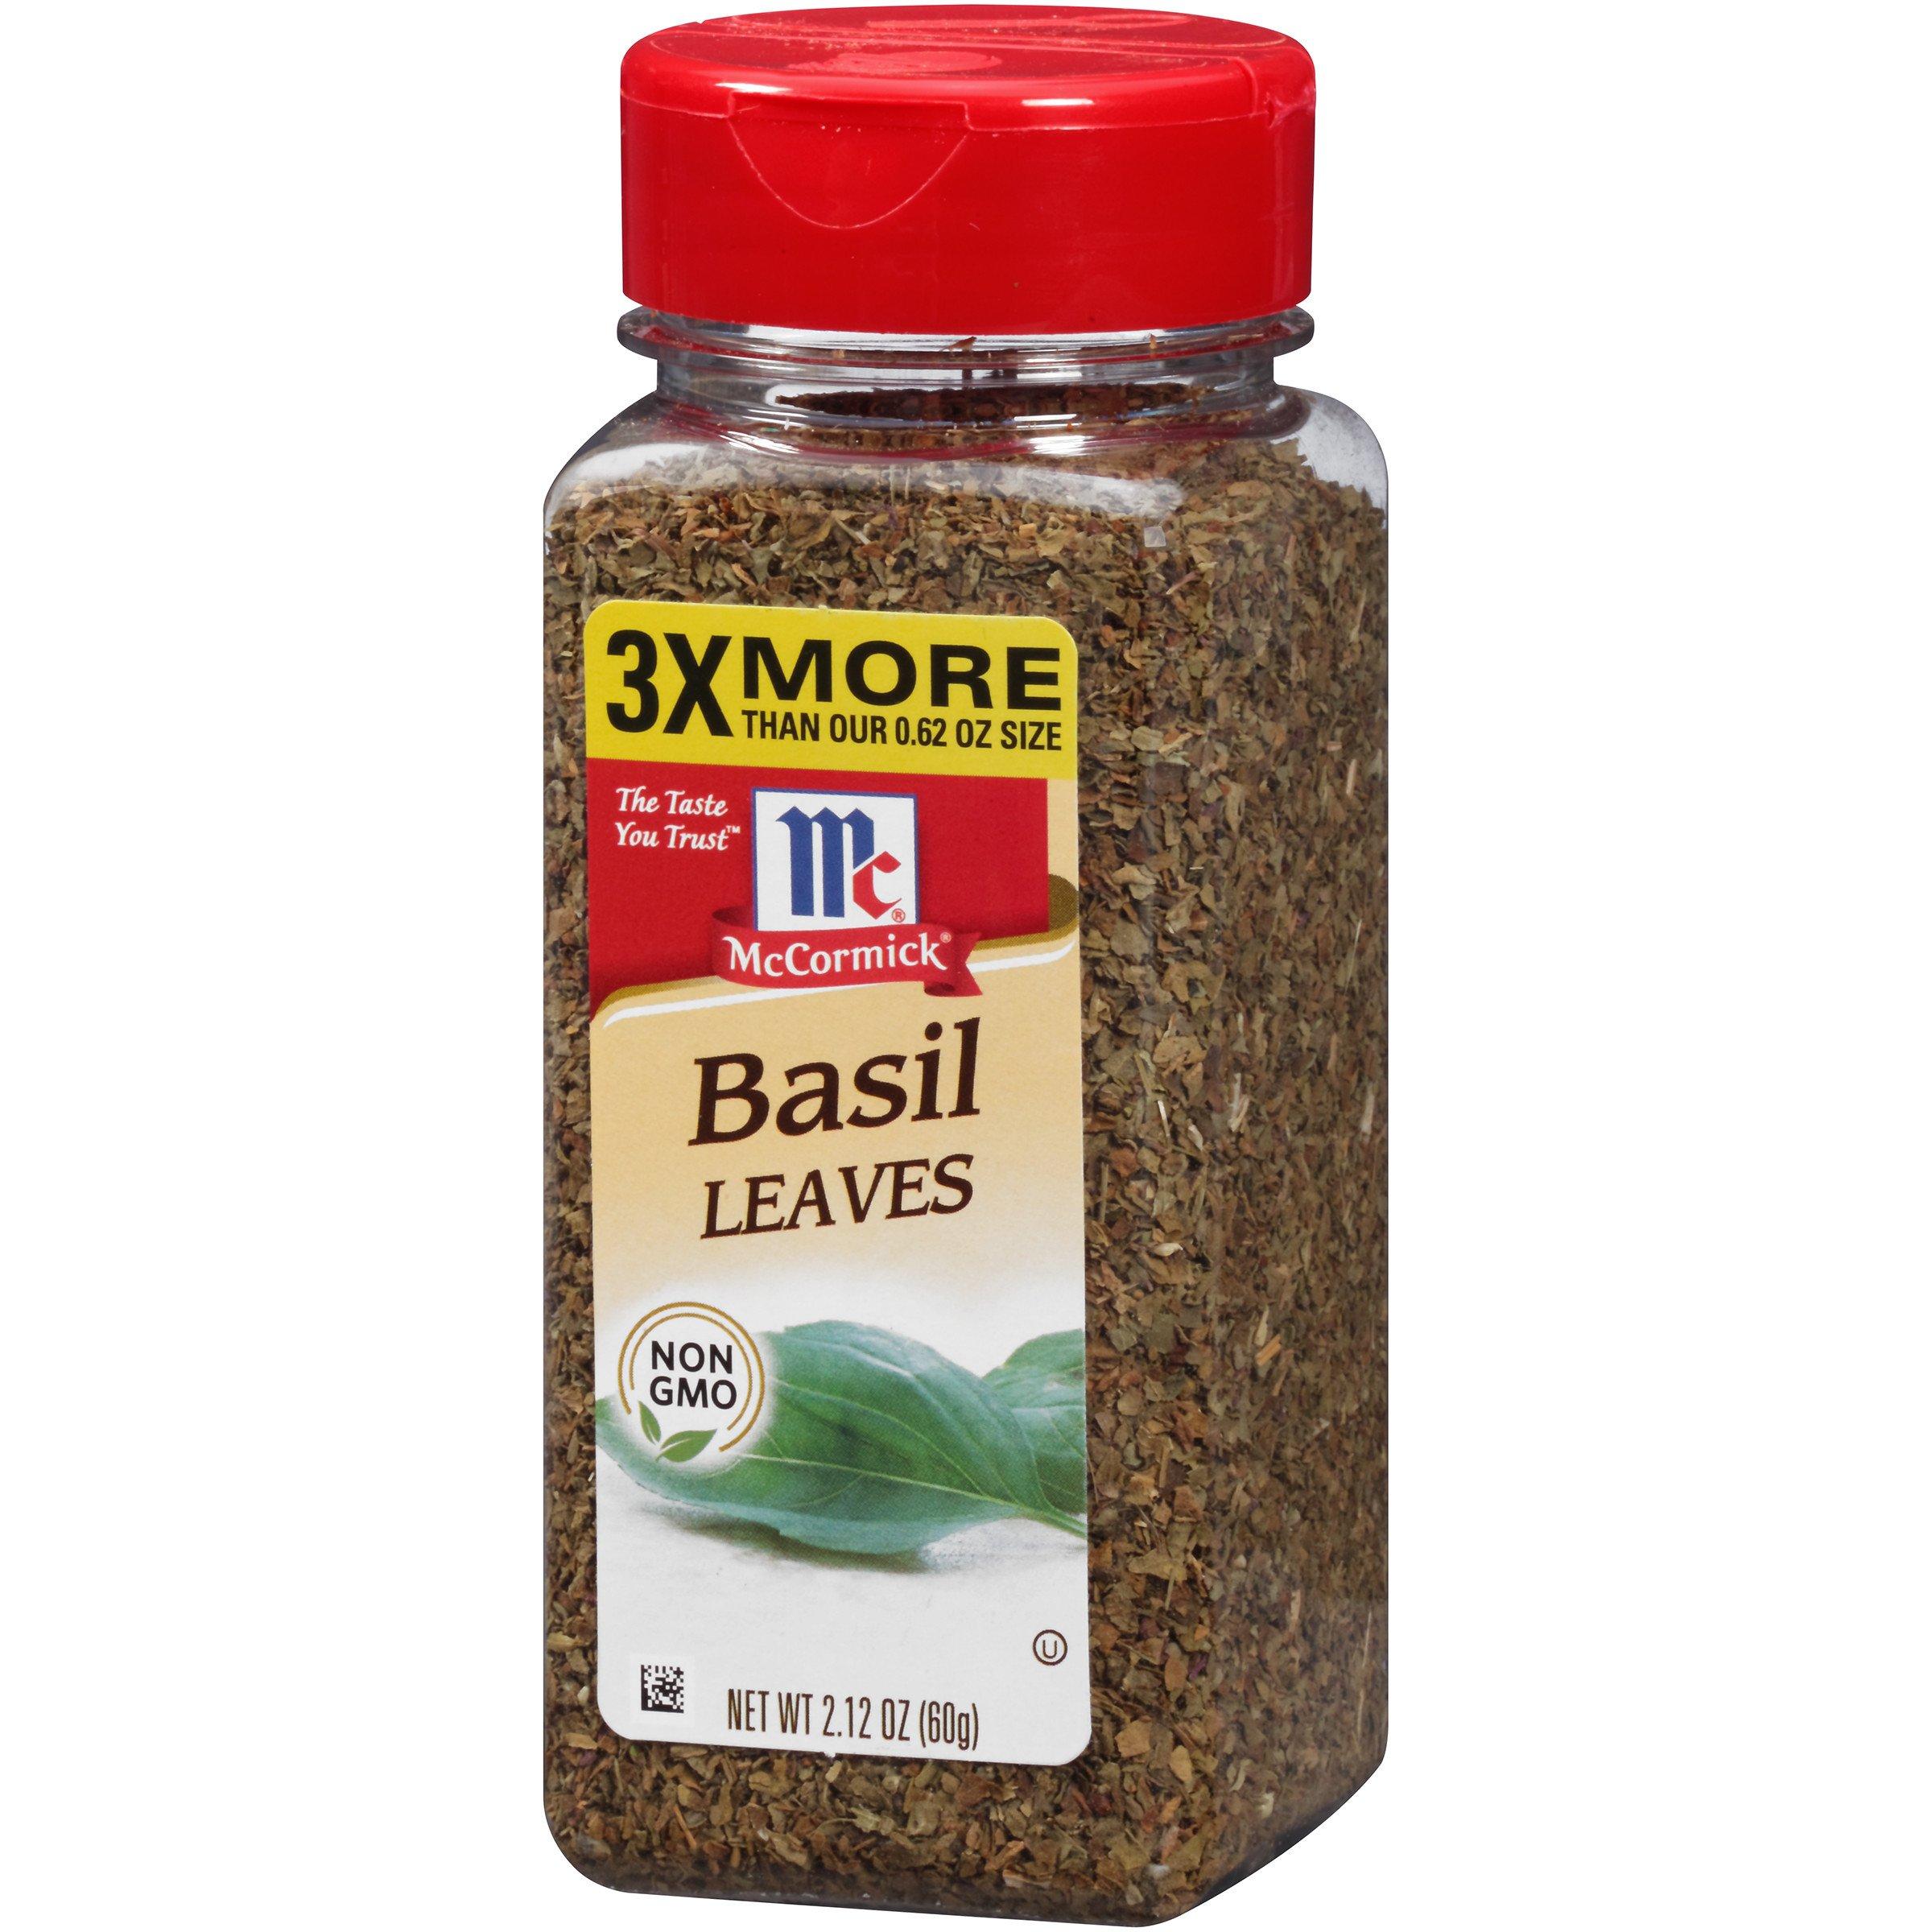 McCormick Basil Leaves, 2.12 oz